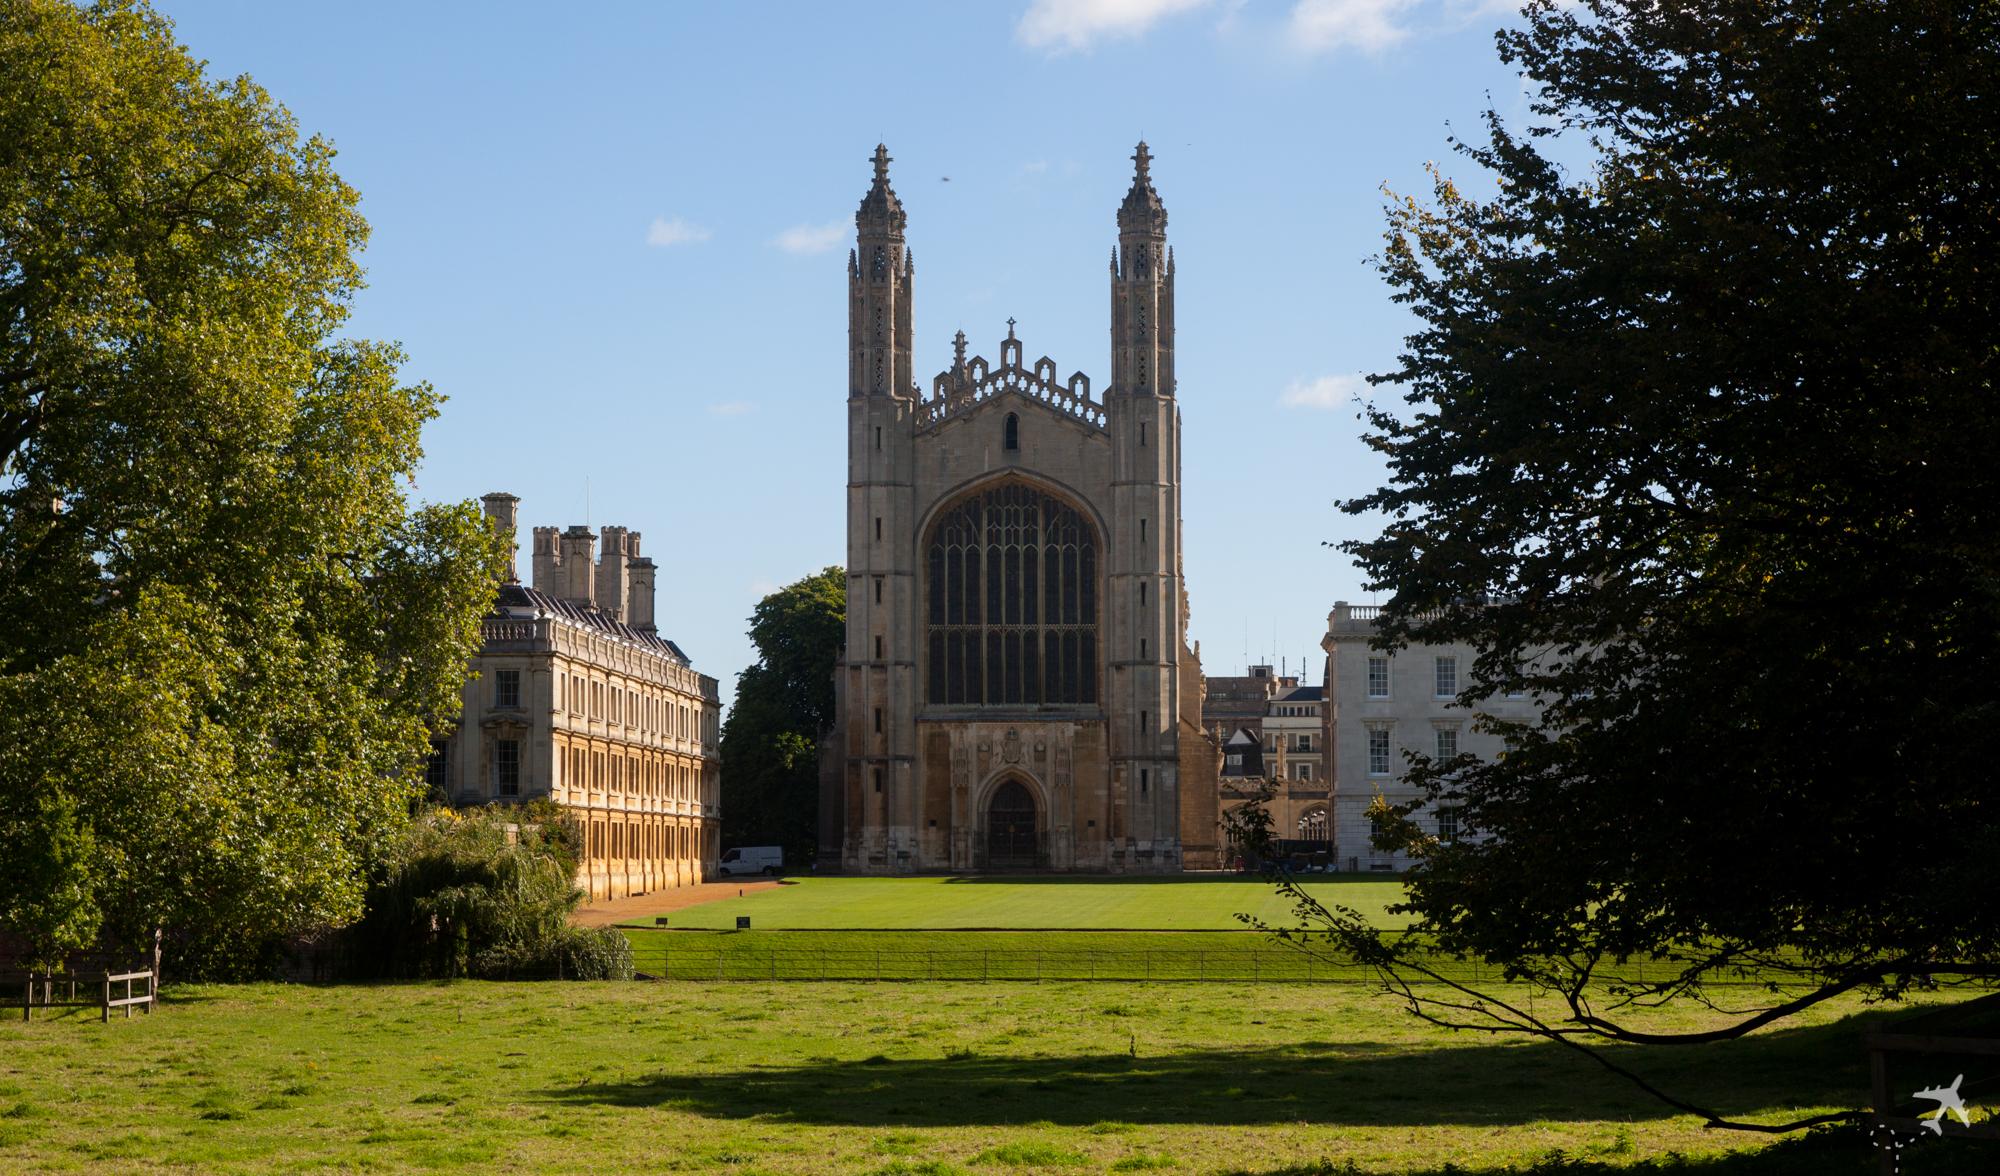 King's College Chapel, Cambringe, Großbritannien